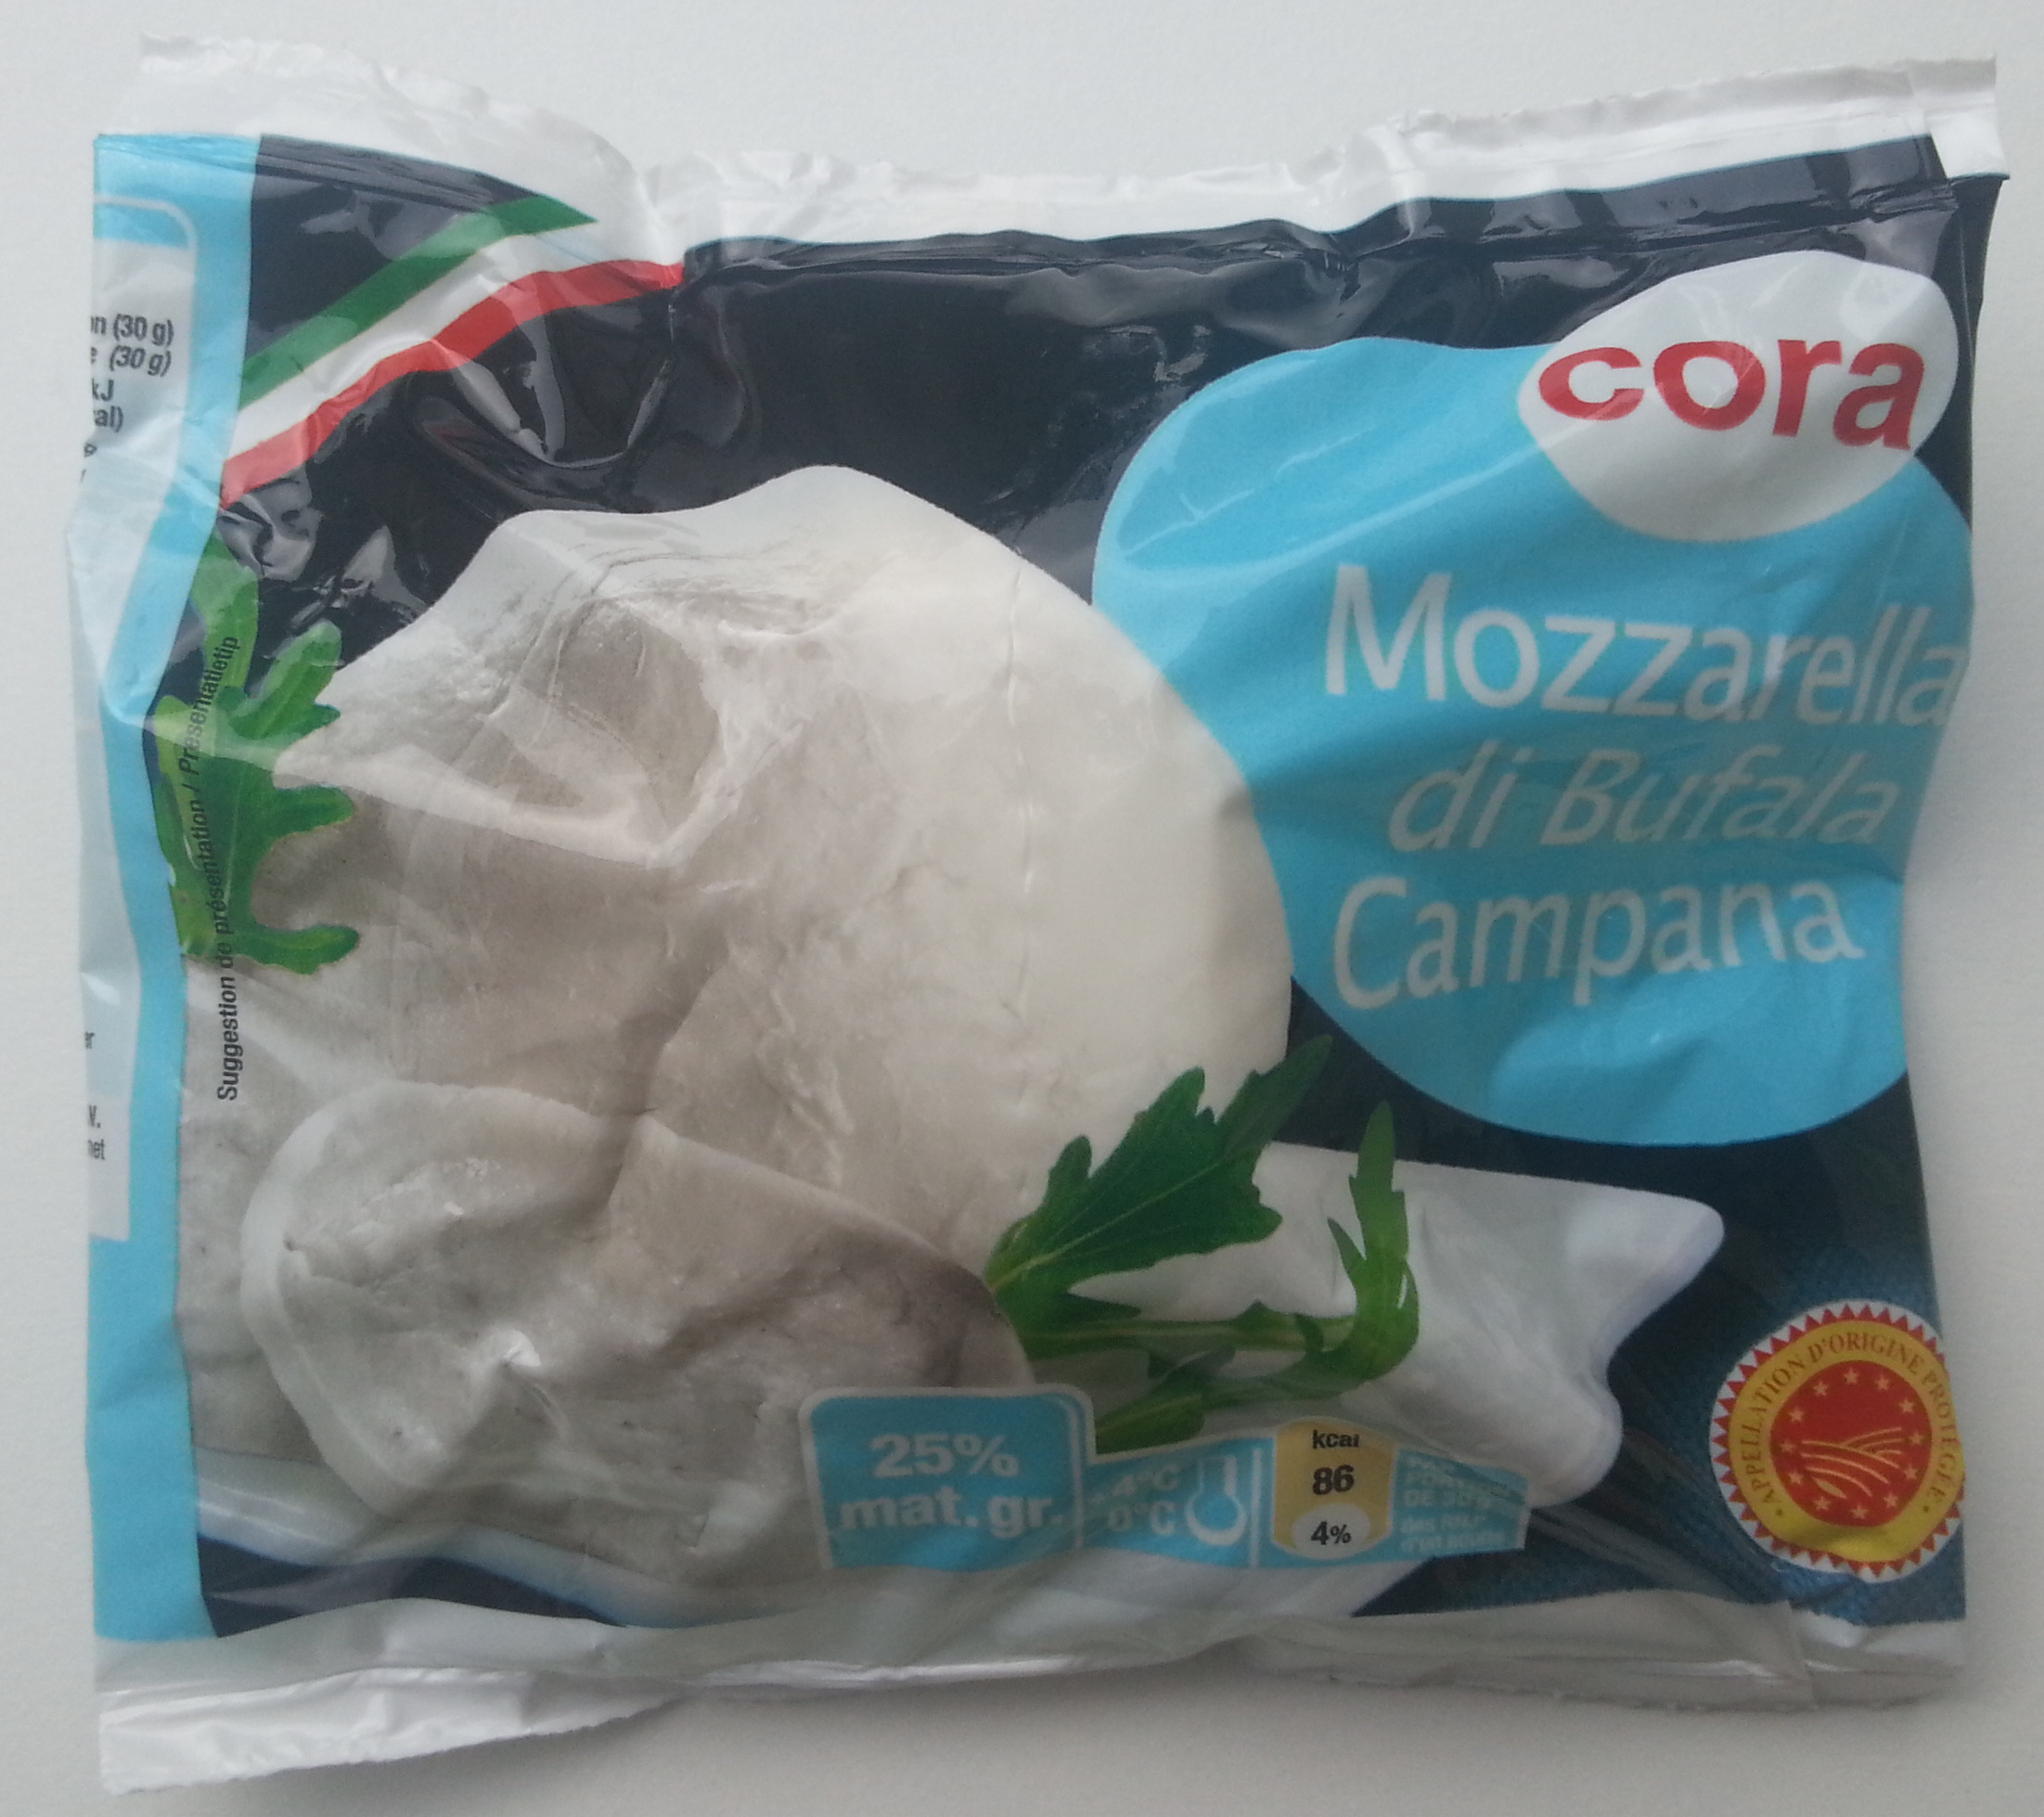 Mozzarella di Bufala Campana AOP (25% MG) - 210 g - Cora - Produit - fr